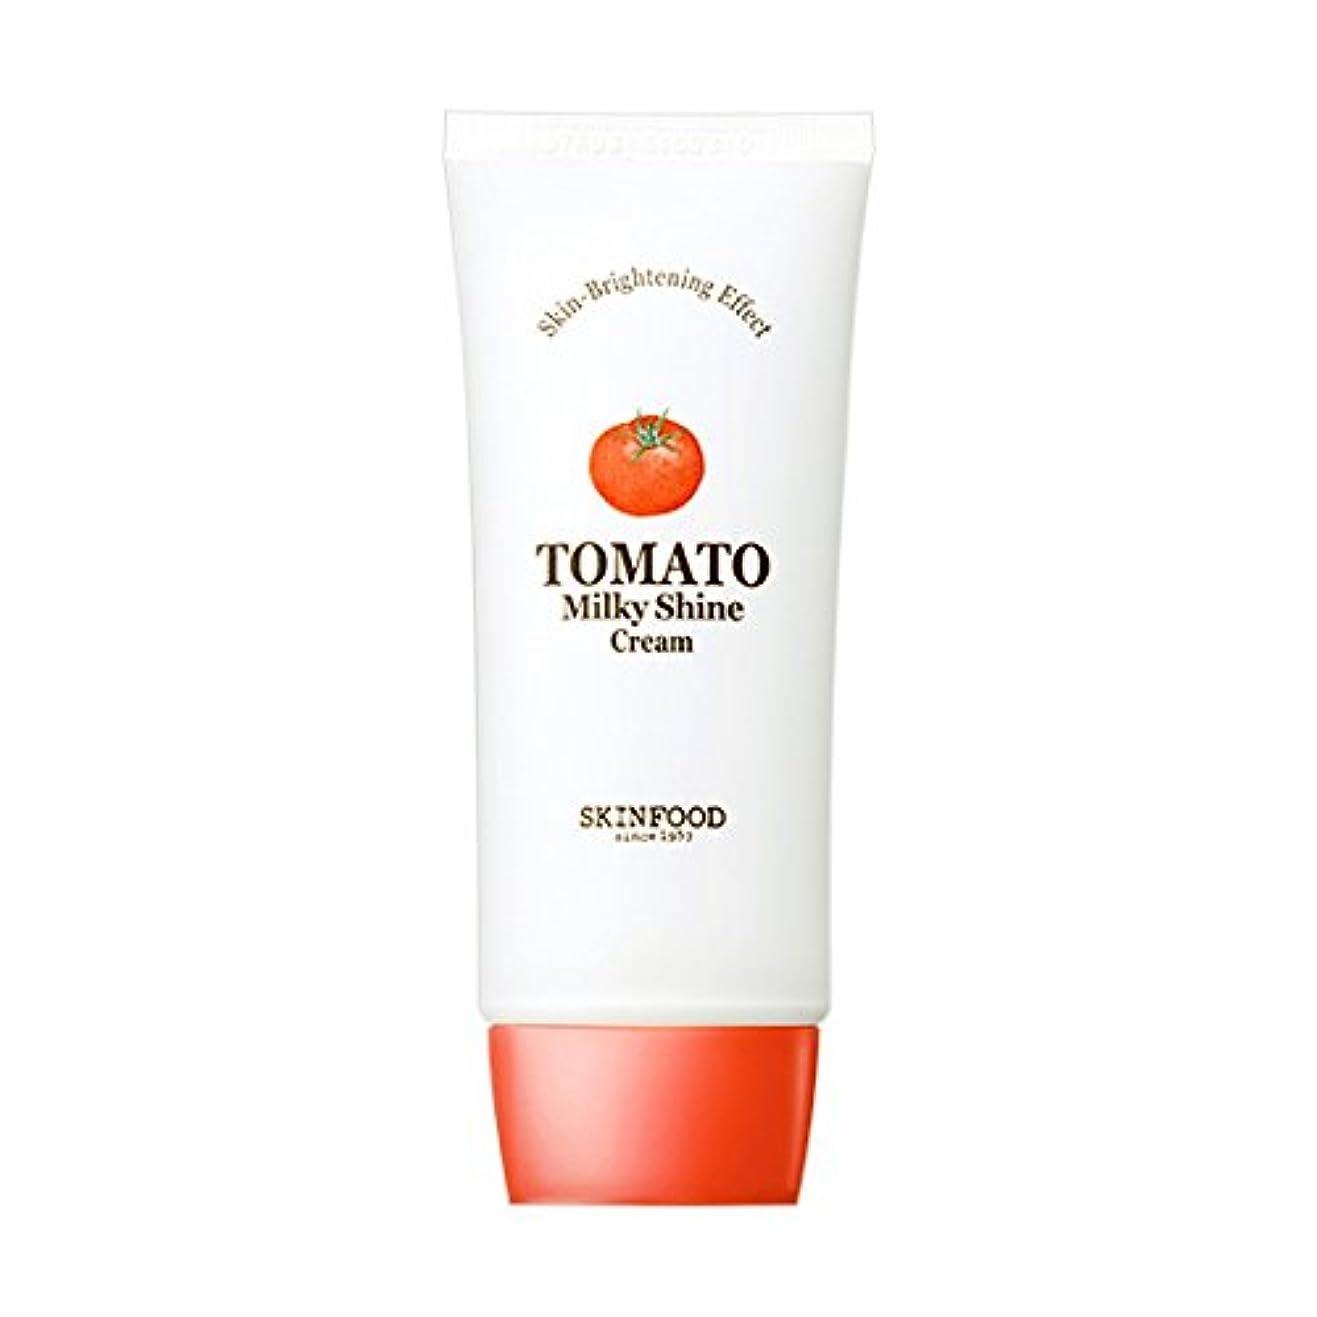 Skinfood トマトミルキーシャインクリーム/omato Milky Shine Cream 50ml [並行輸入品]